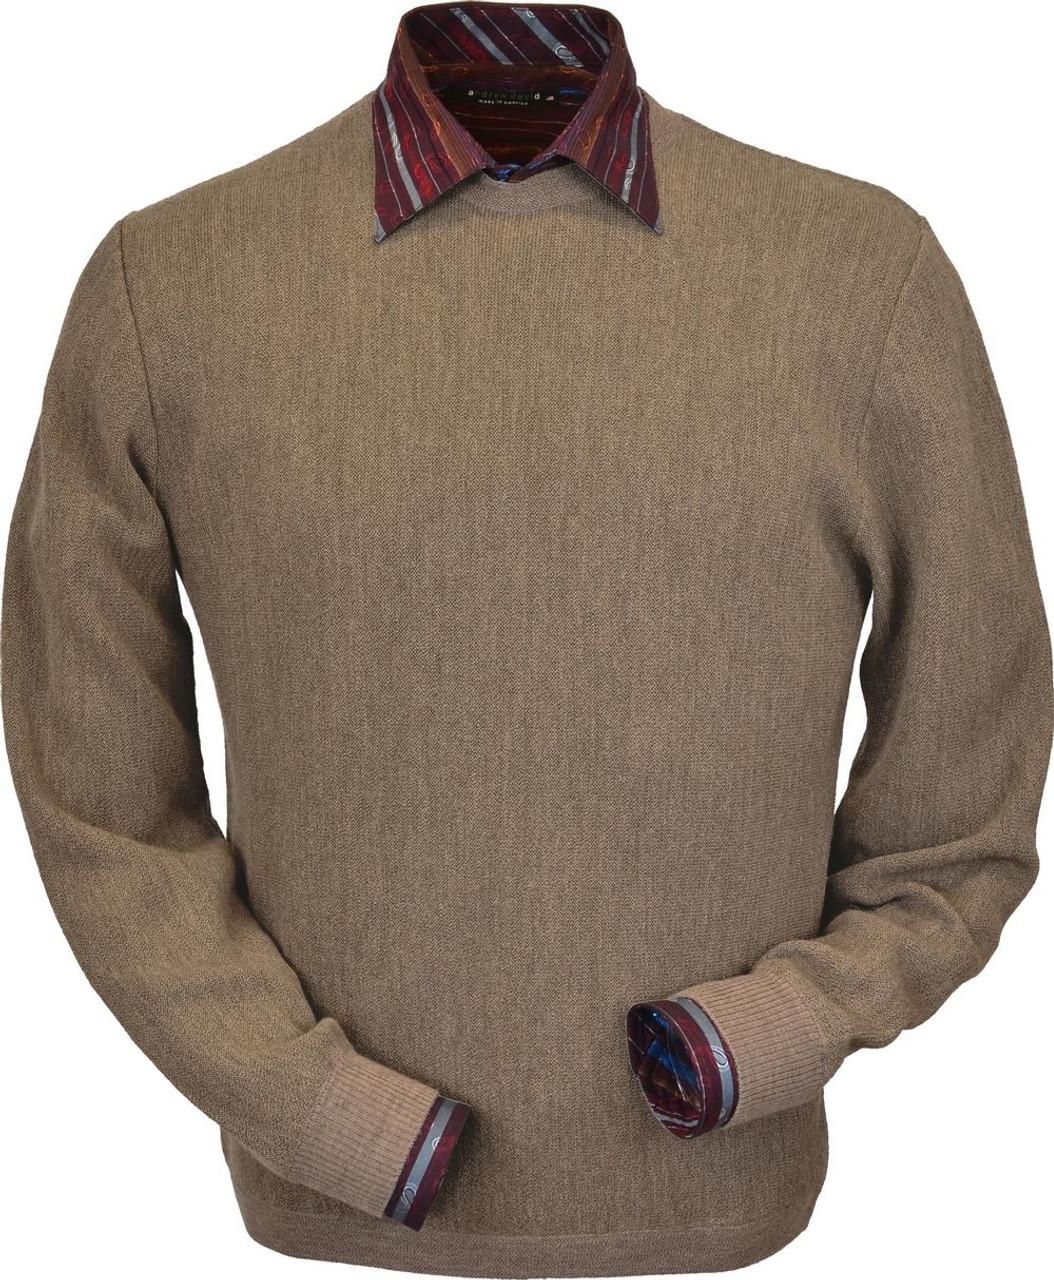 13e565753 Baby Alpaca Crewneck Sweater